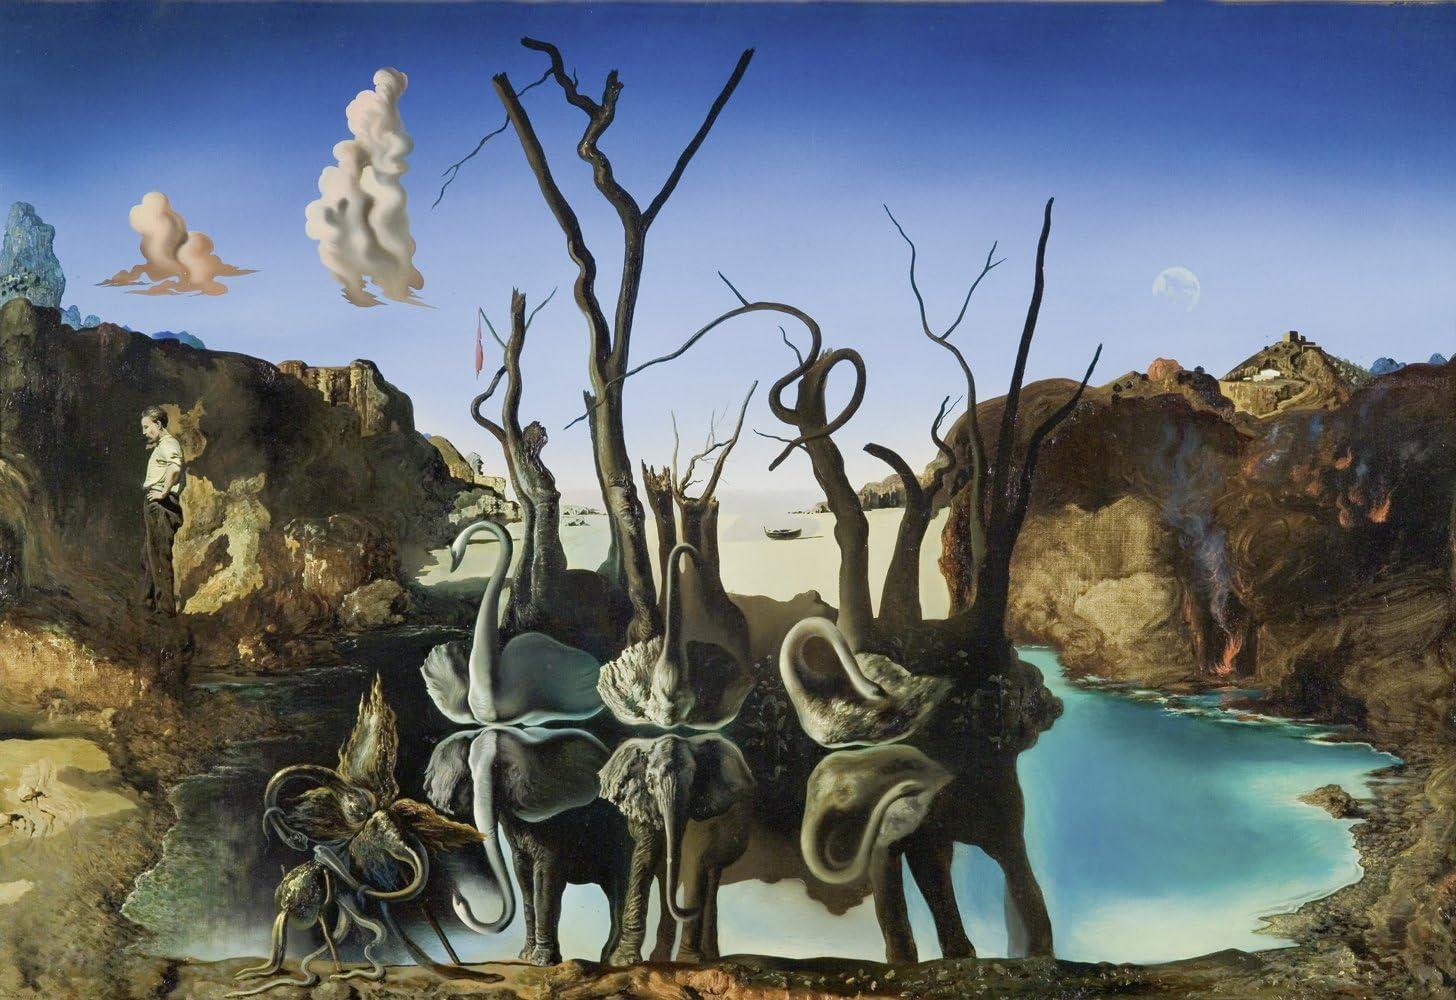 Get Custom Art Salvador Dali - Swans Reflecting Elephants, Poster Art Print Wall Decor - Size 16x24 Inches